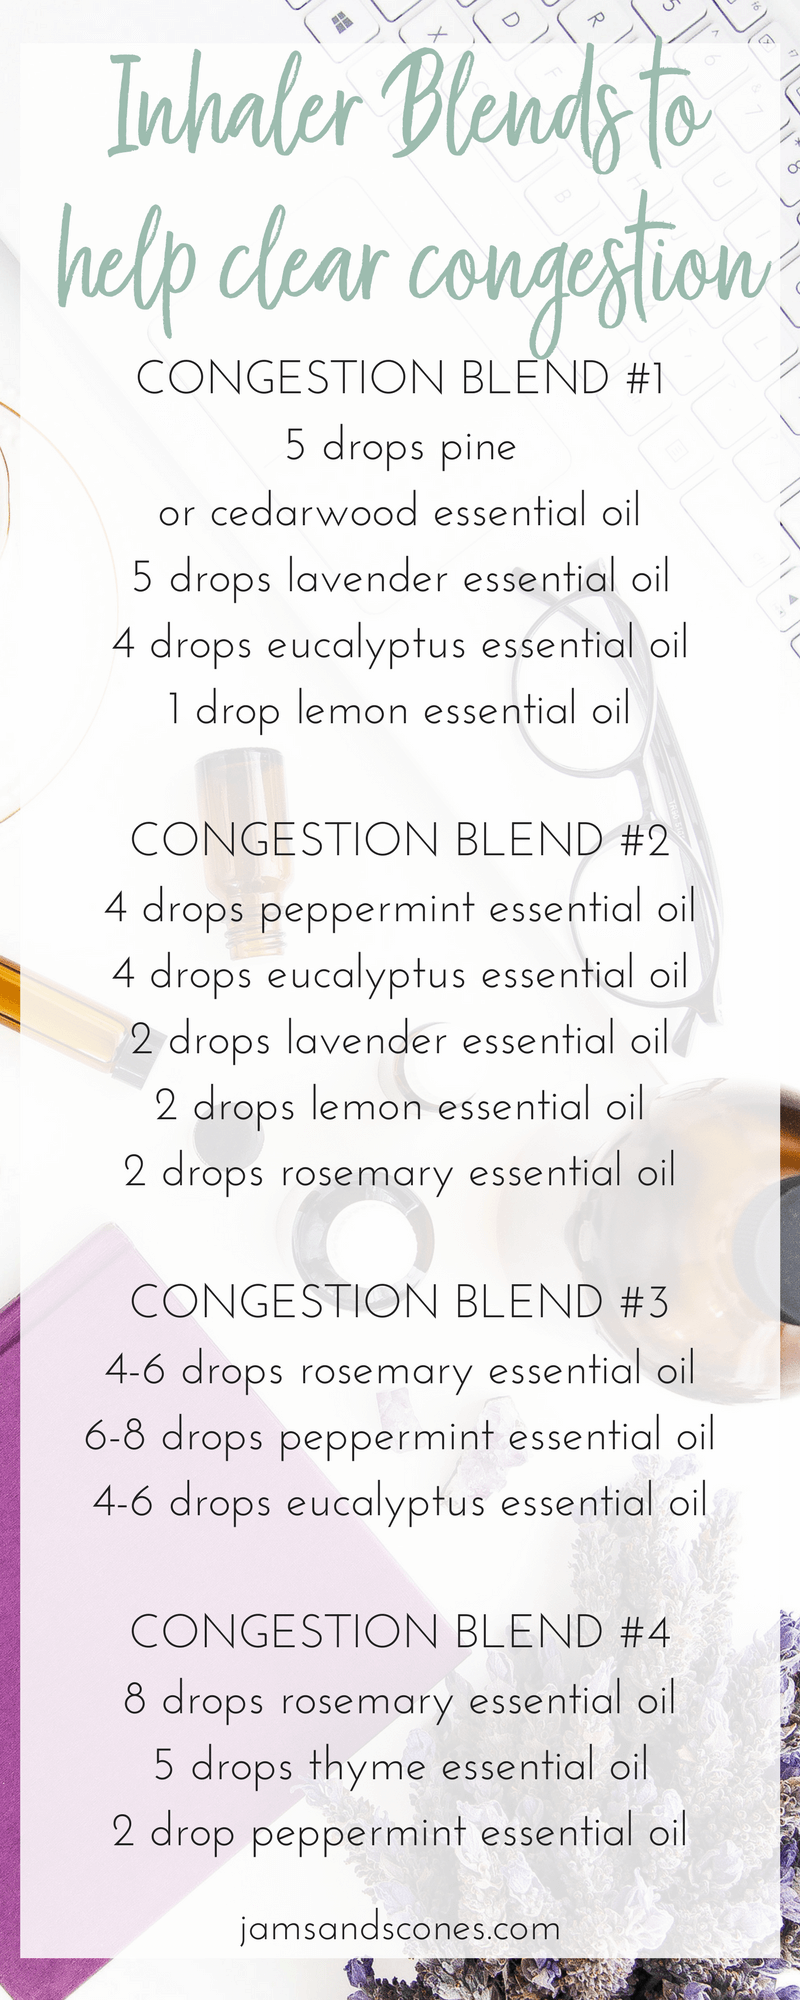 DIY Essential Oil Inhaler Recipes for Colds & Flu - Jams and Scones